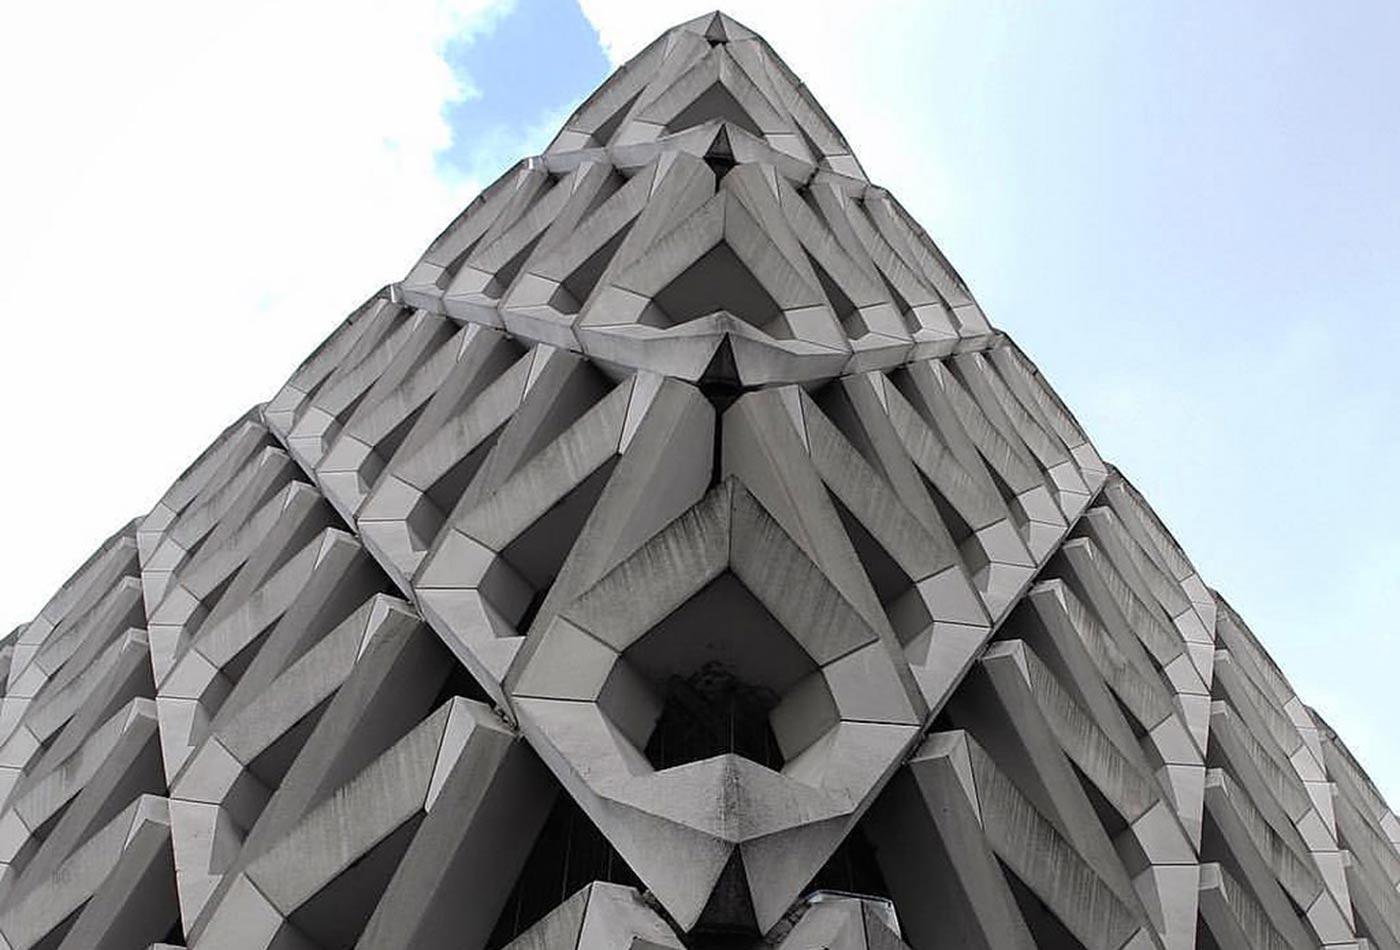 Interlocked concrete polygons.